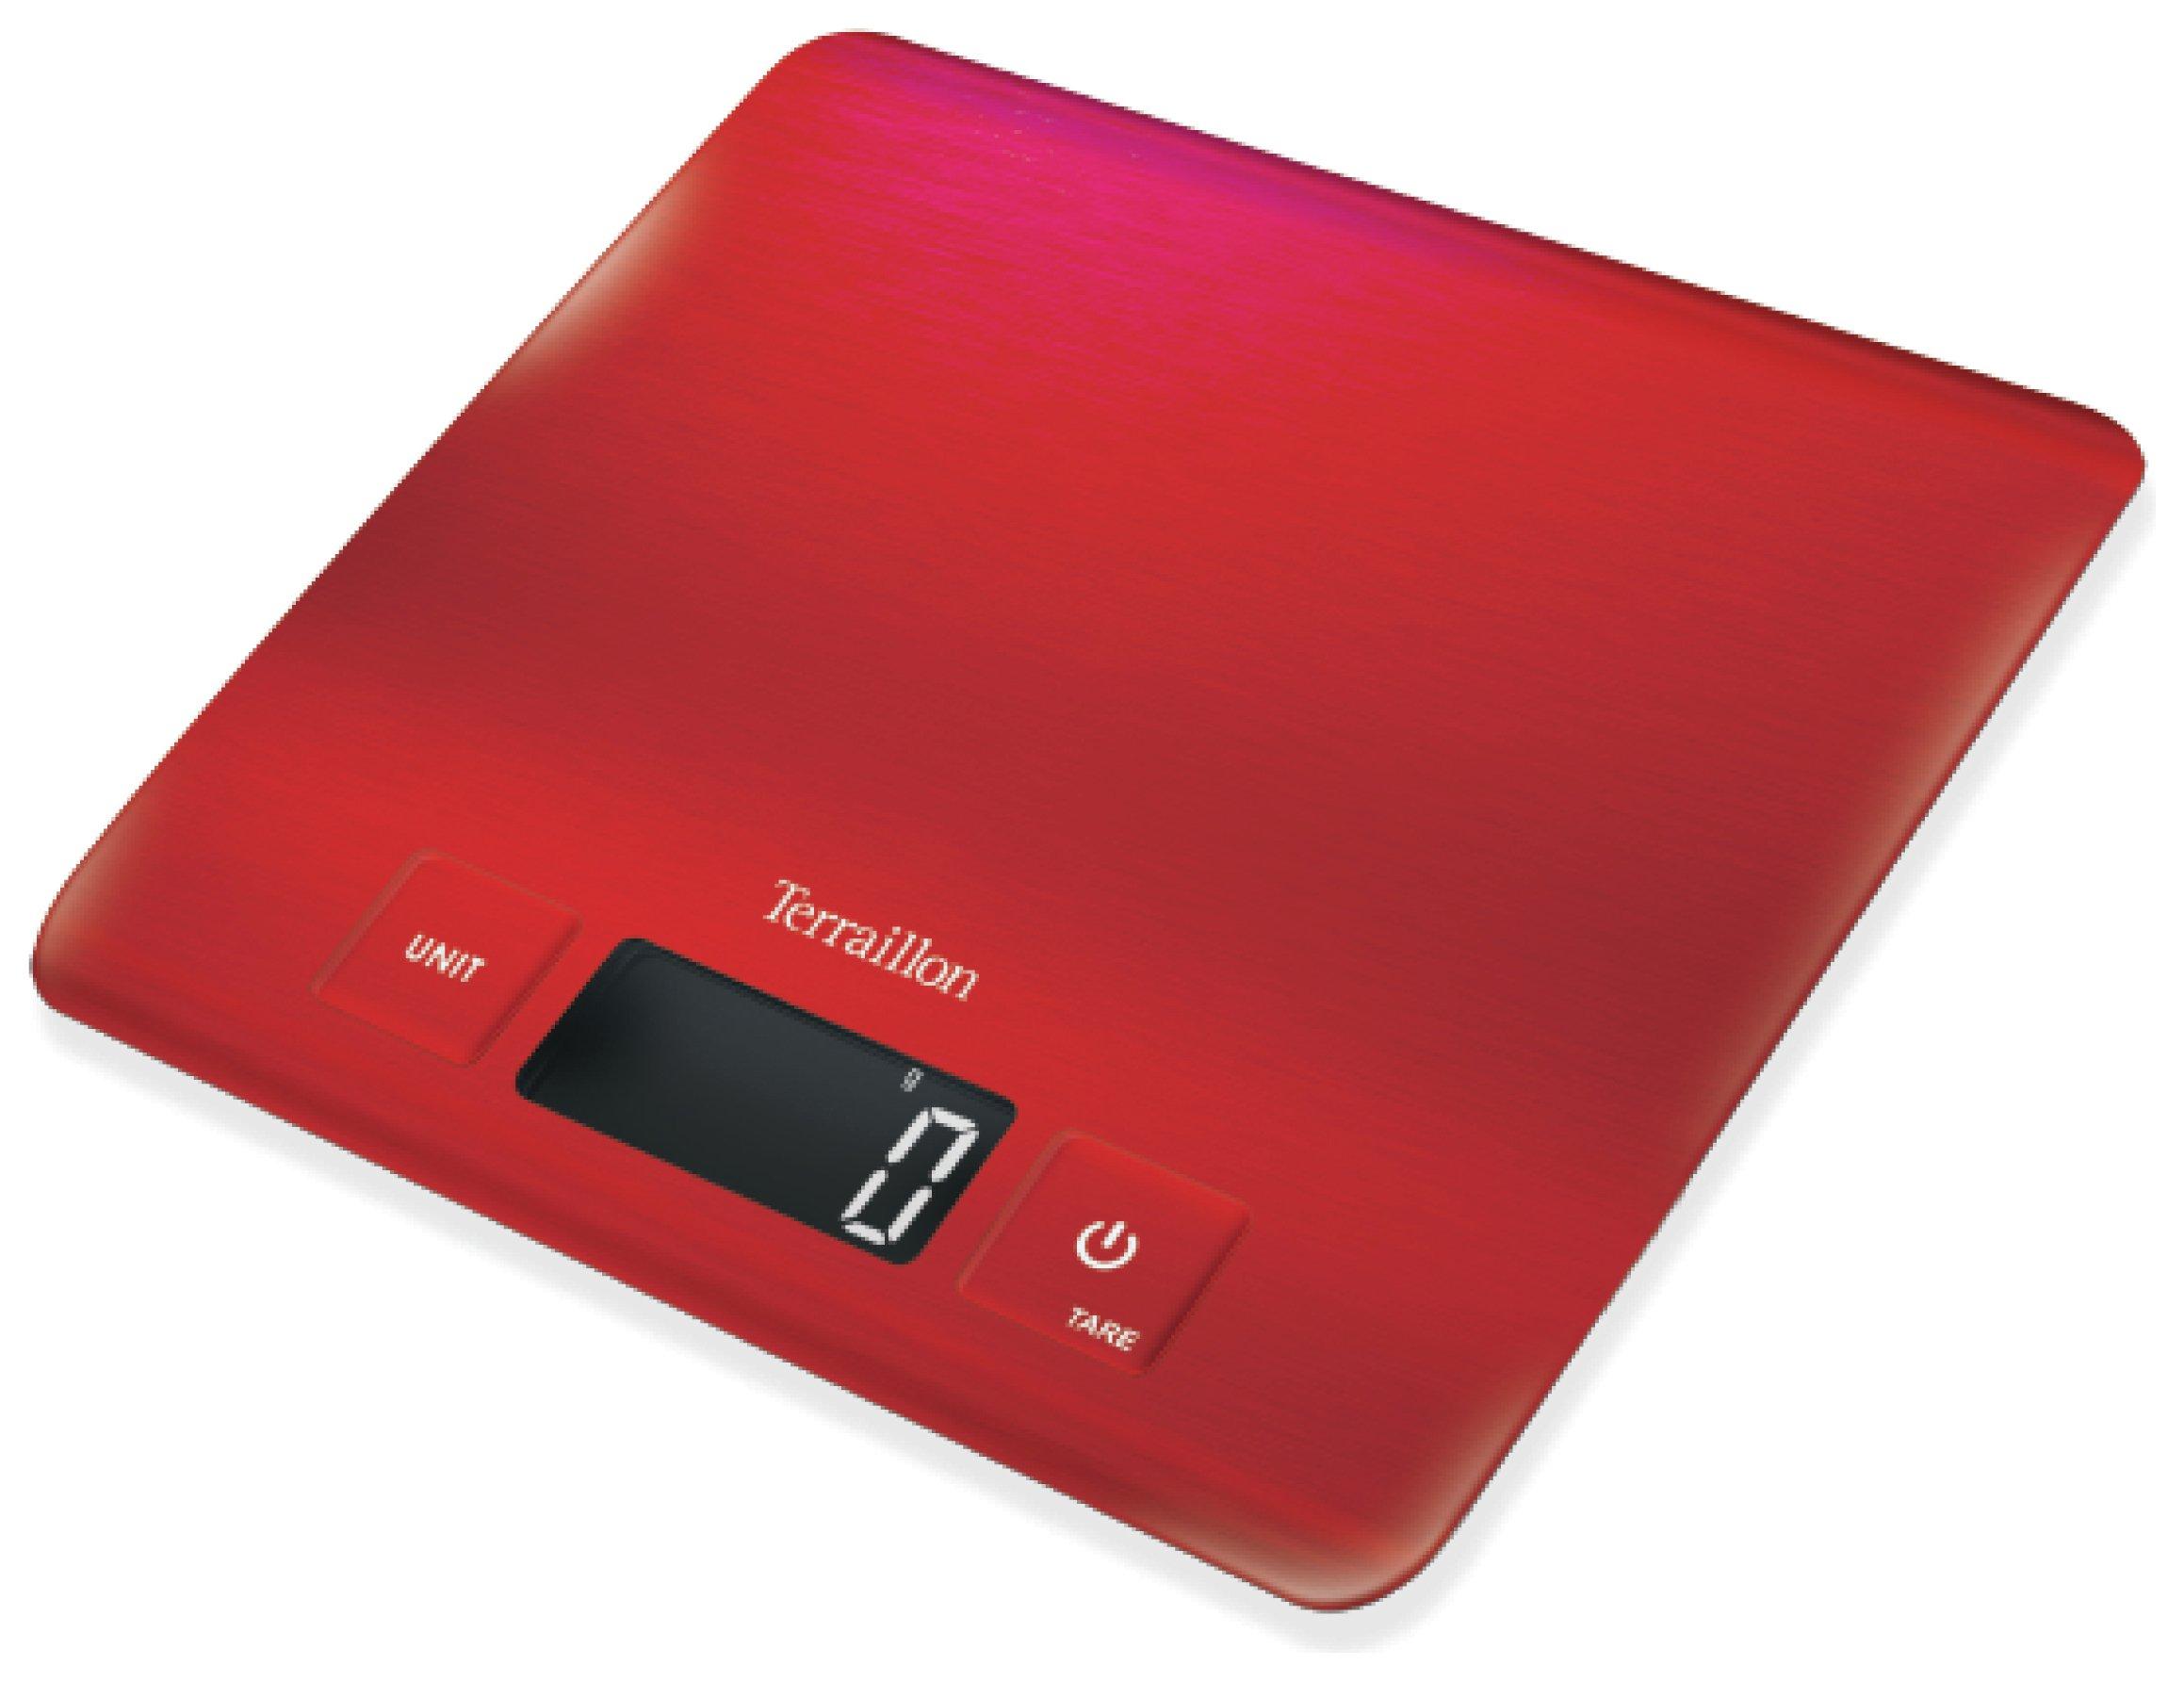 terraillon-carre-inox-5kg-ultra-slim-scale-red